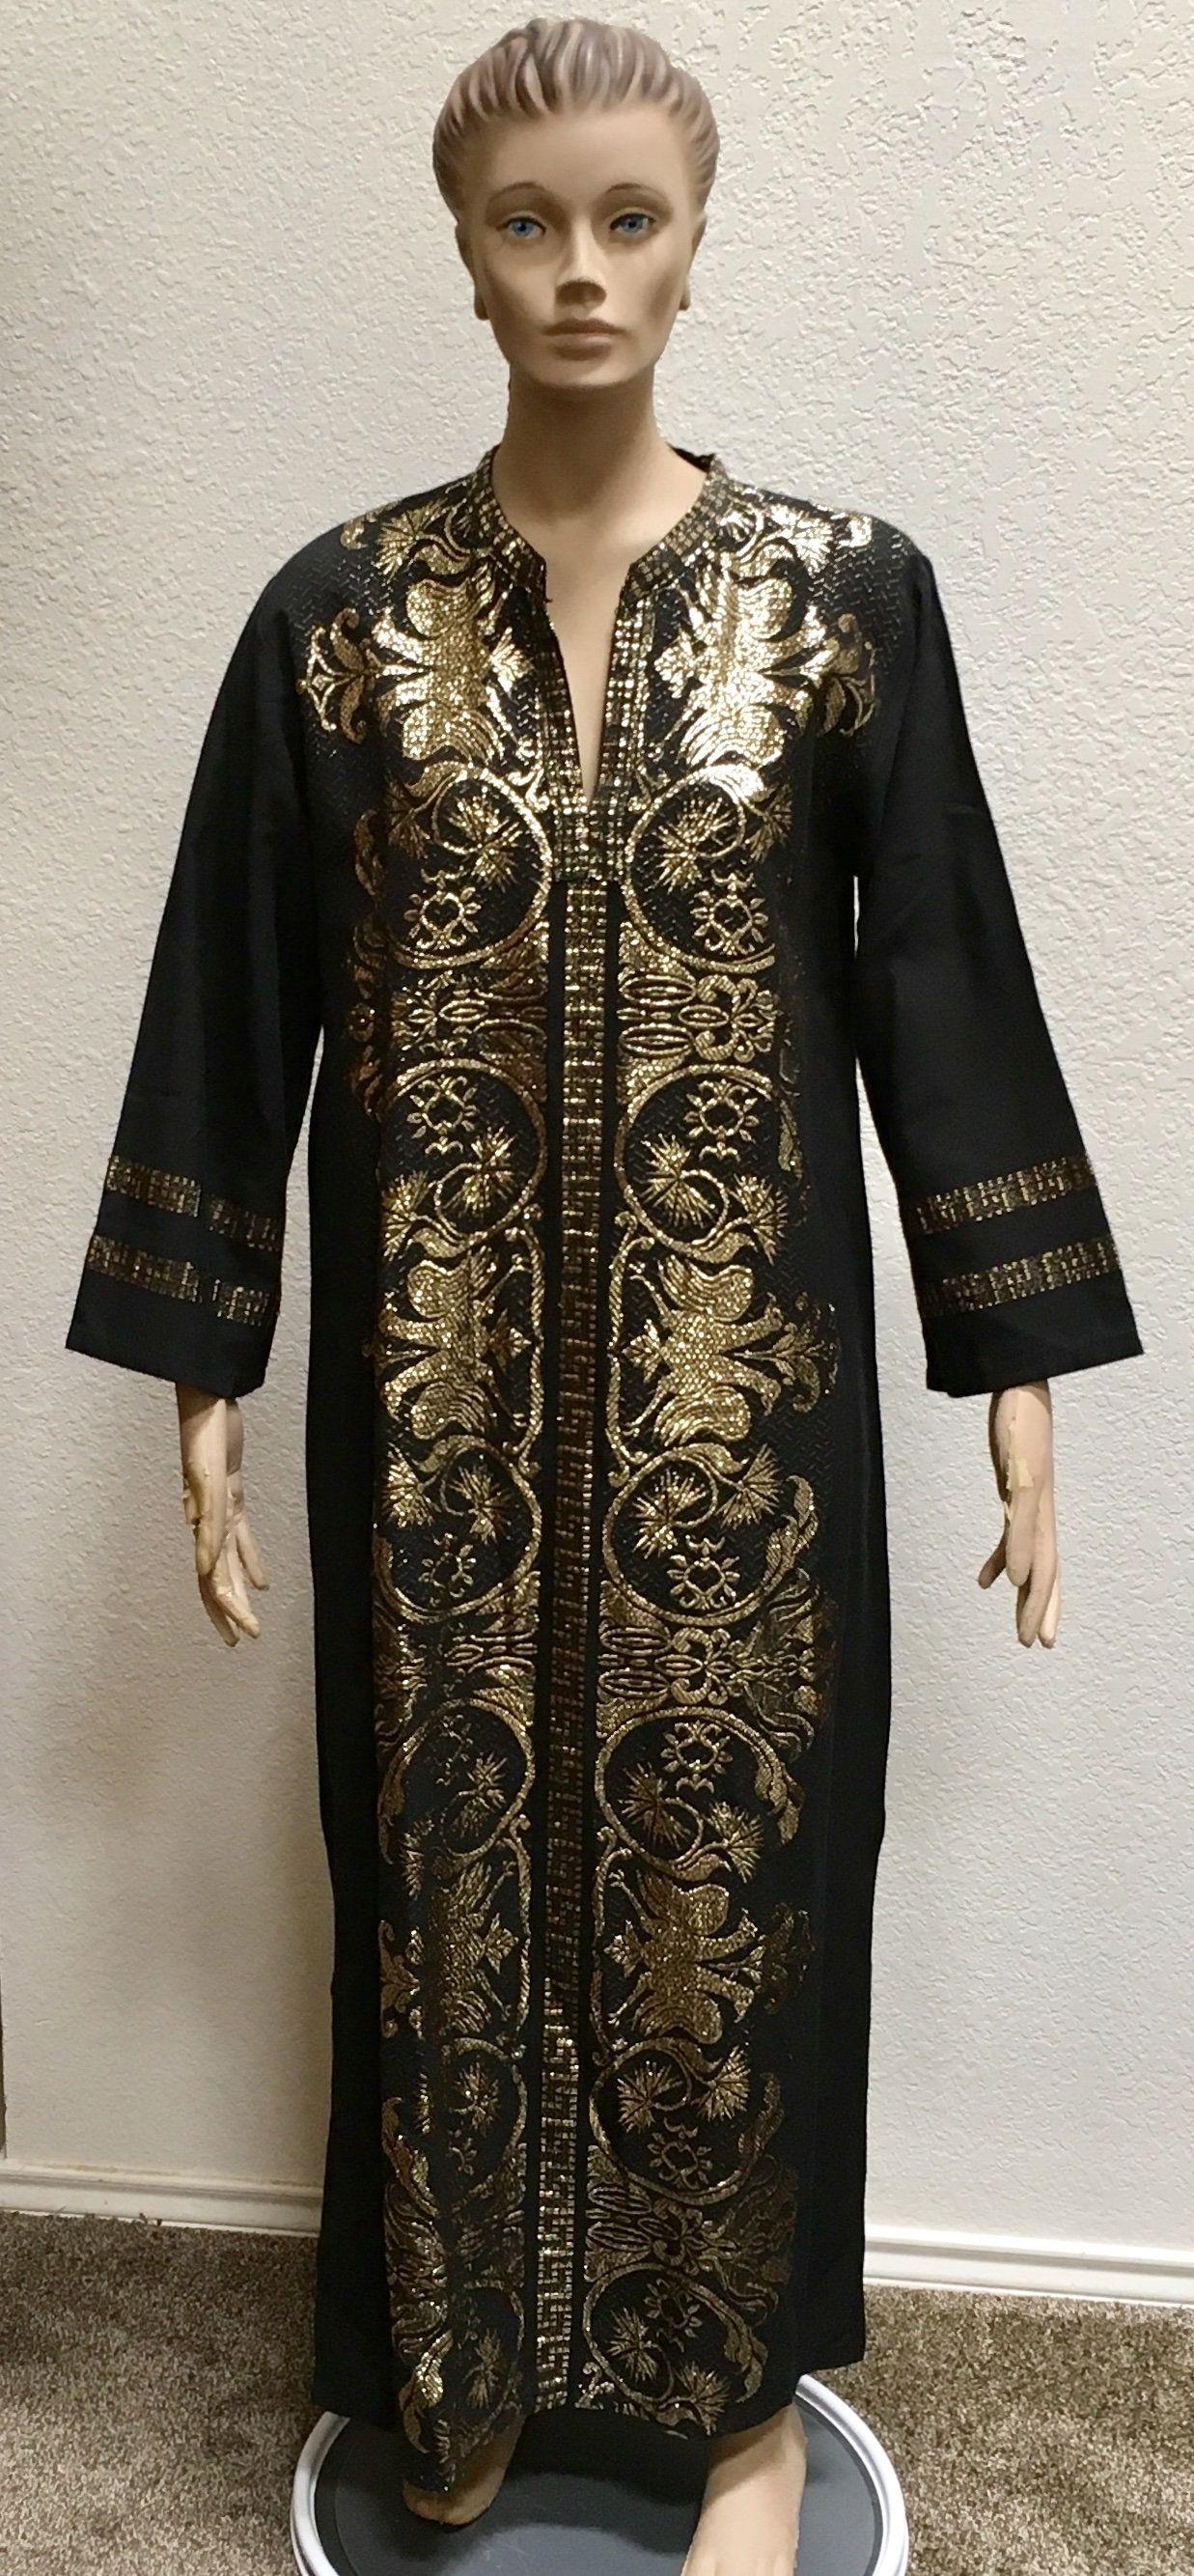 S greek embroidered caftan metallic gold black m de sigoura cotton